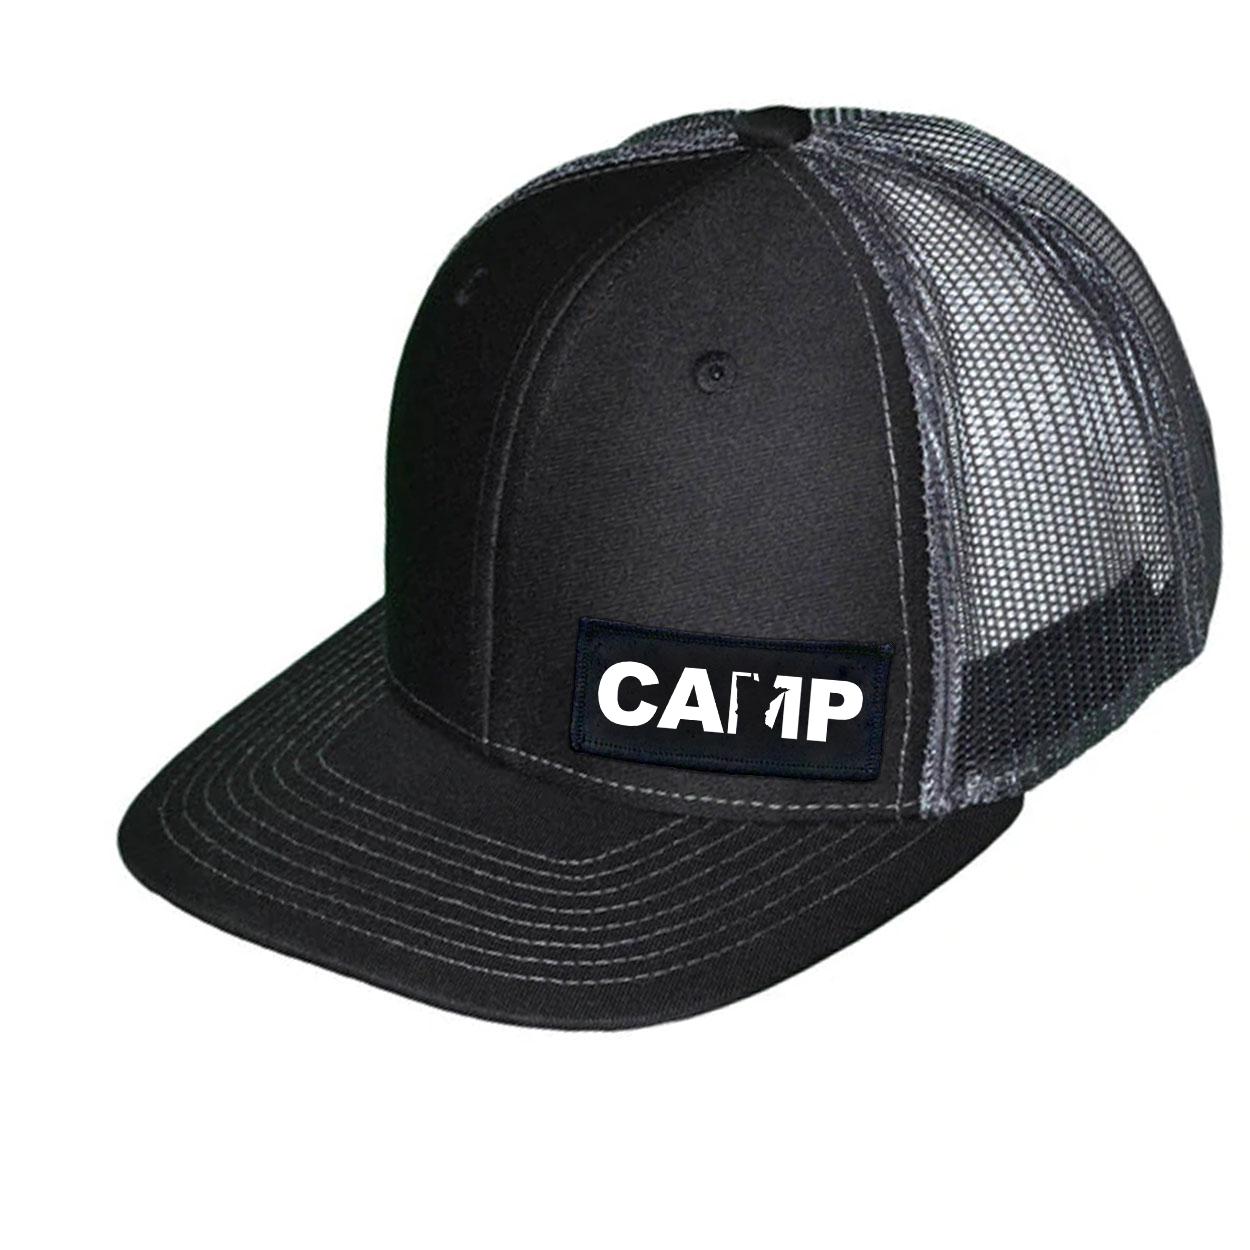 Camp Minnesota Night Out Woven Patch Snapback Trucker Hat Black/Dark Gray (White Logo)